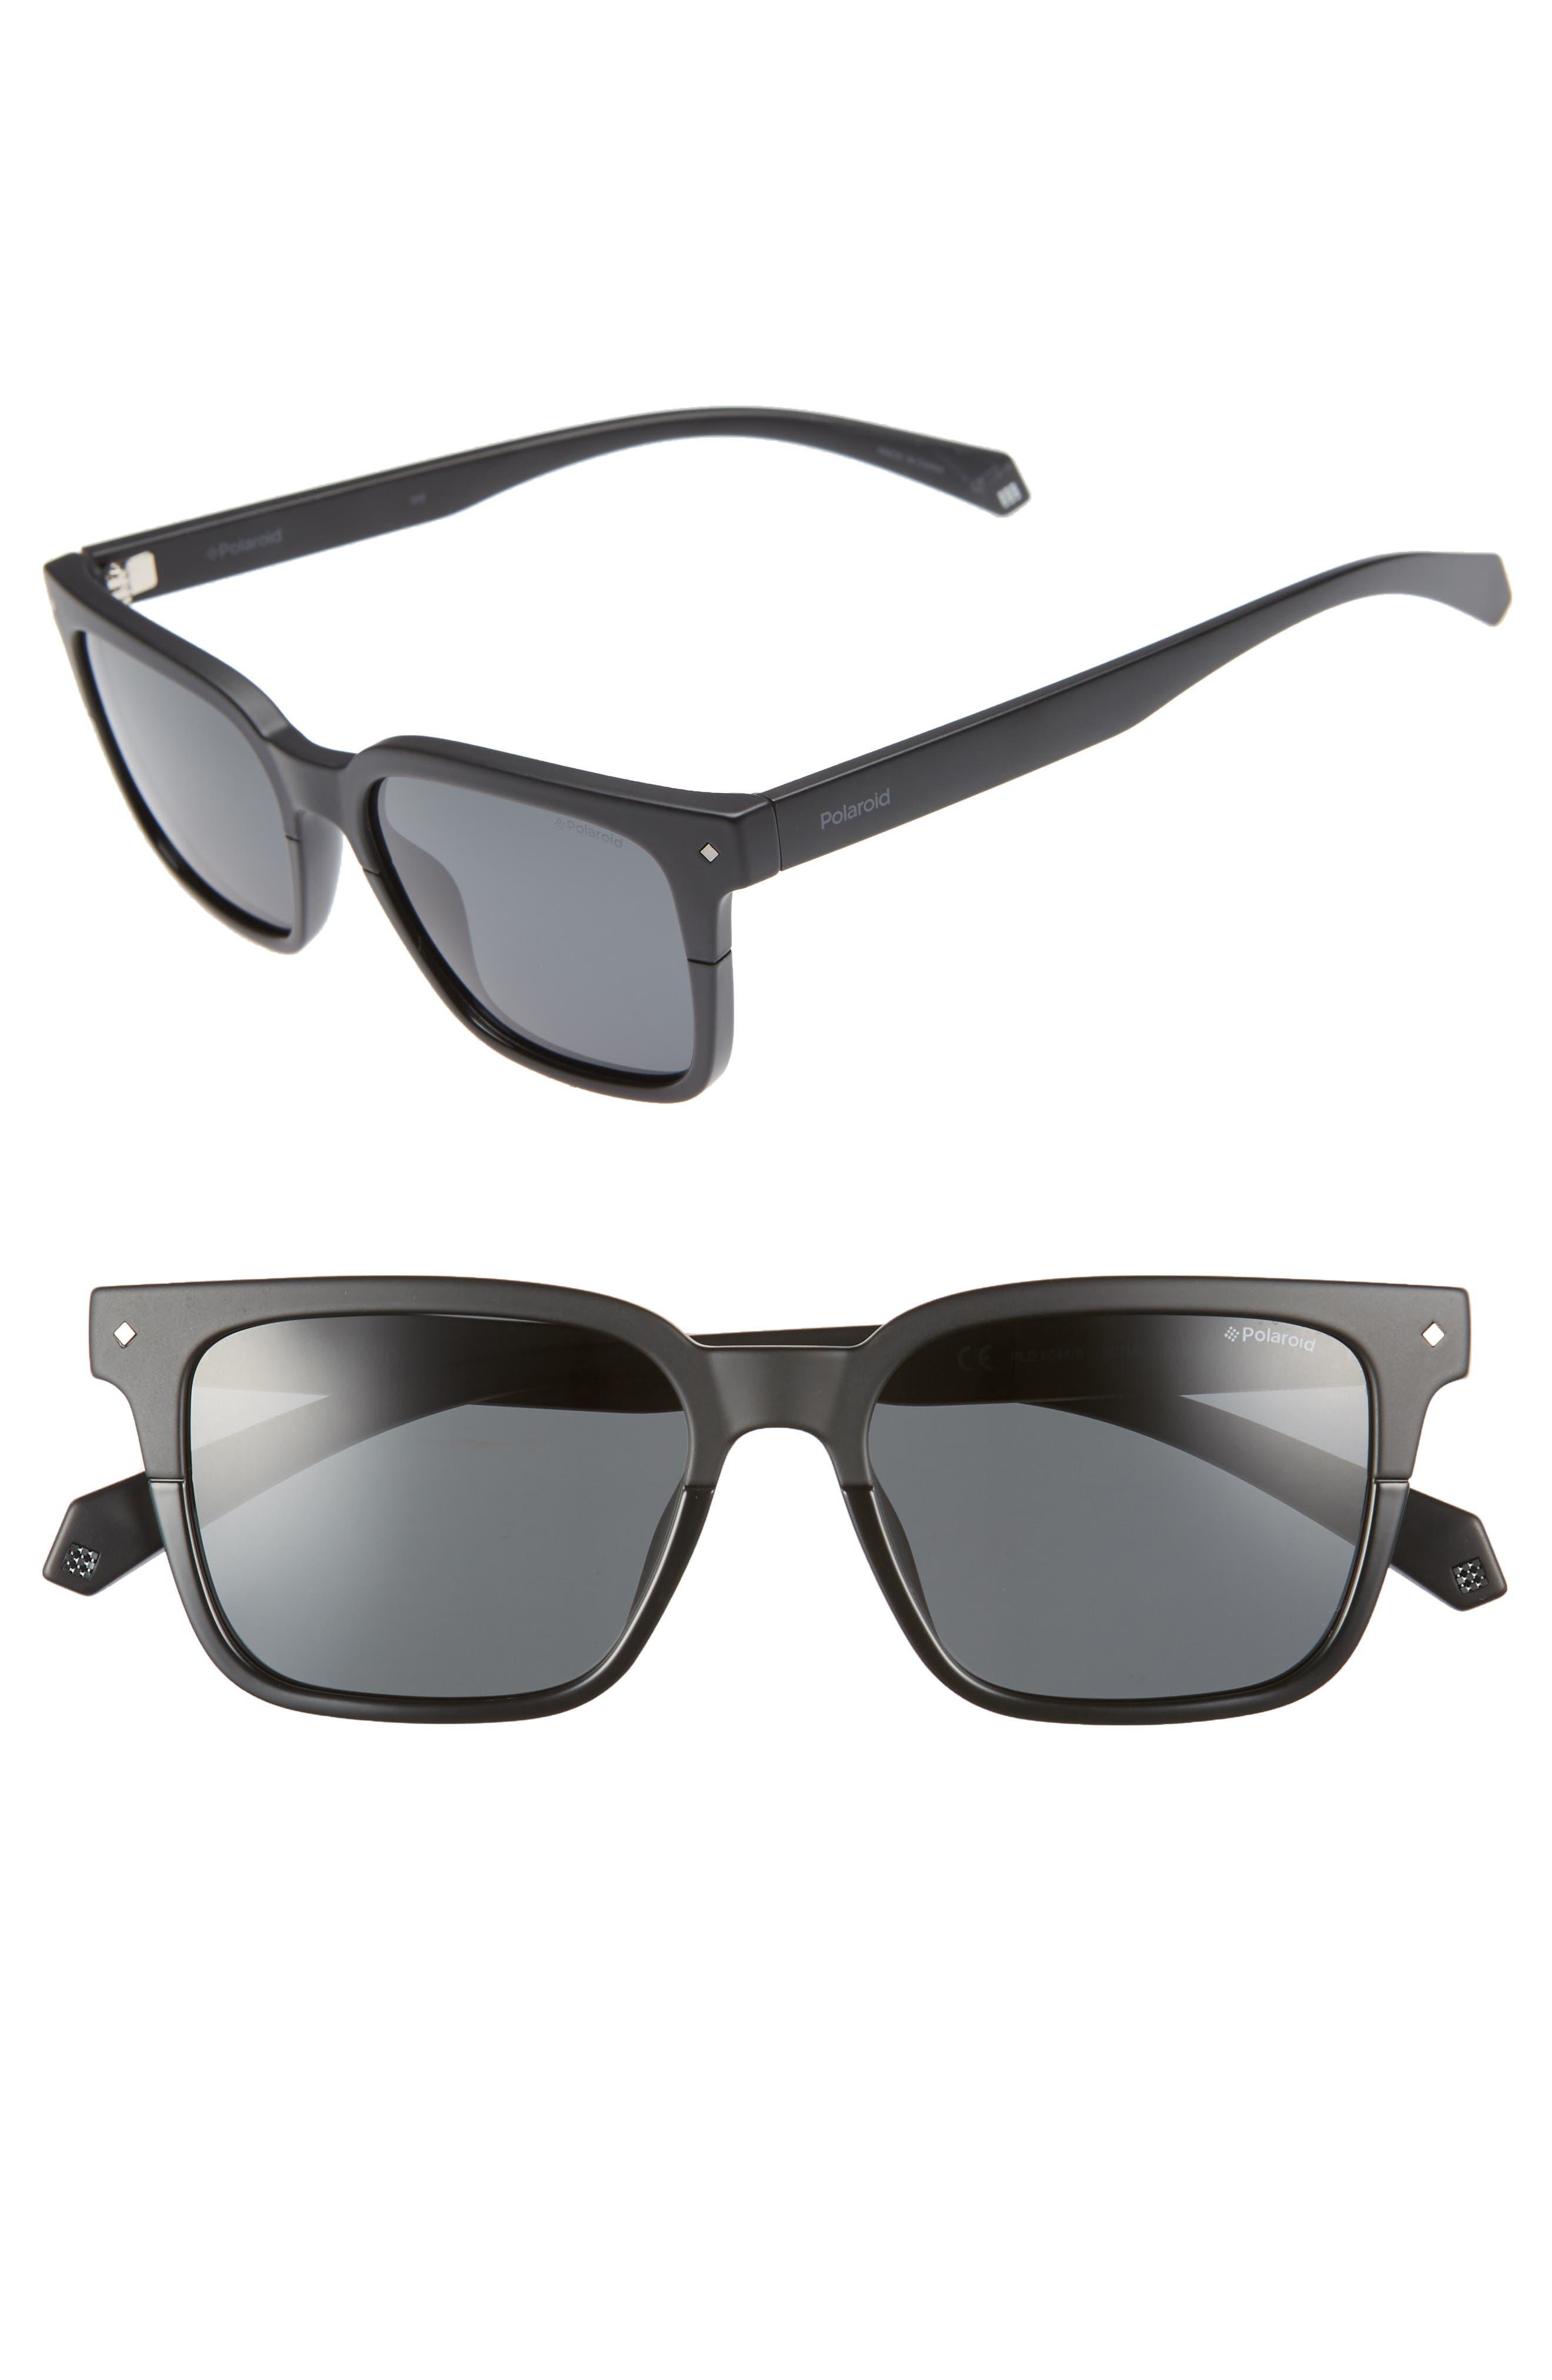 Polaroid 52Mm Polarized Sunglasses - Black